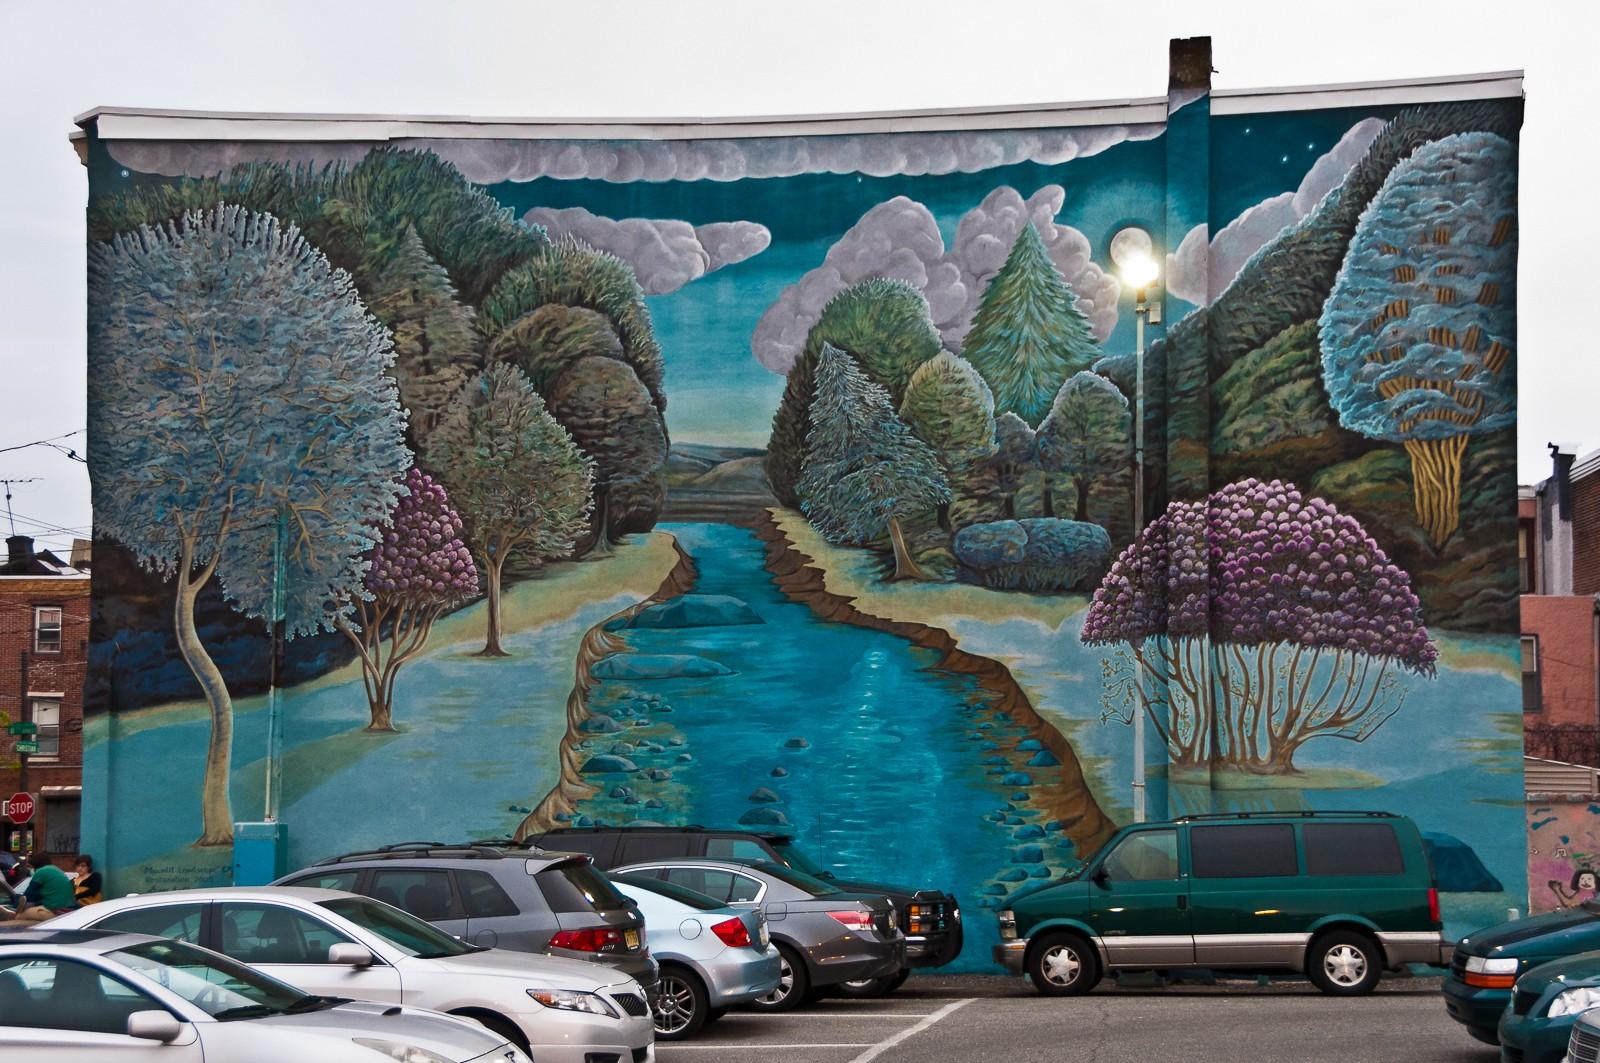 wall-mural-7434